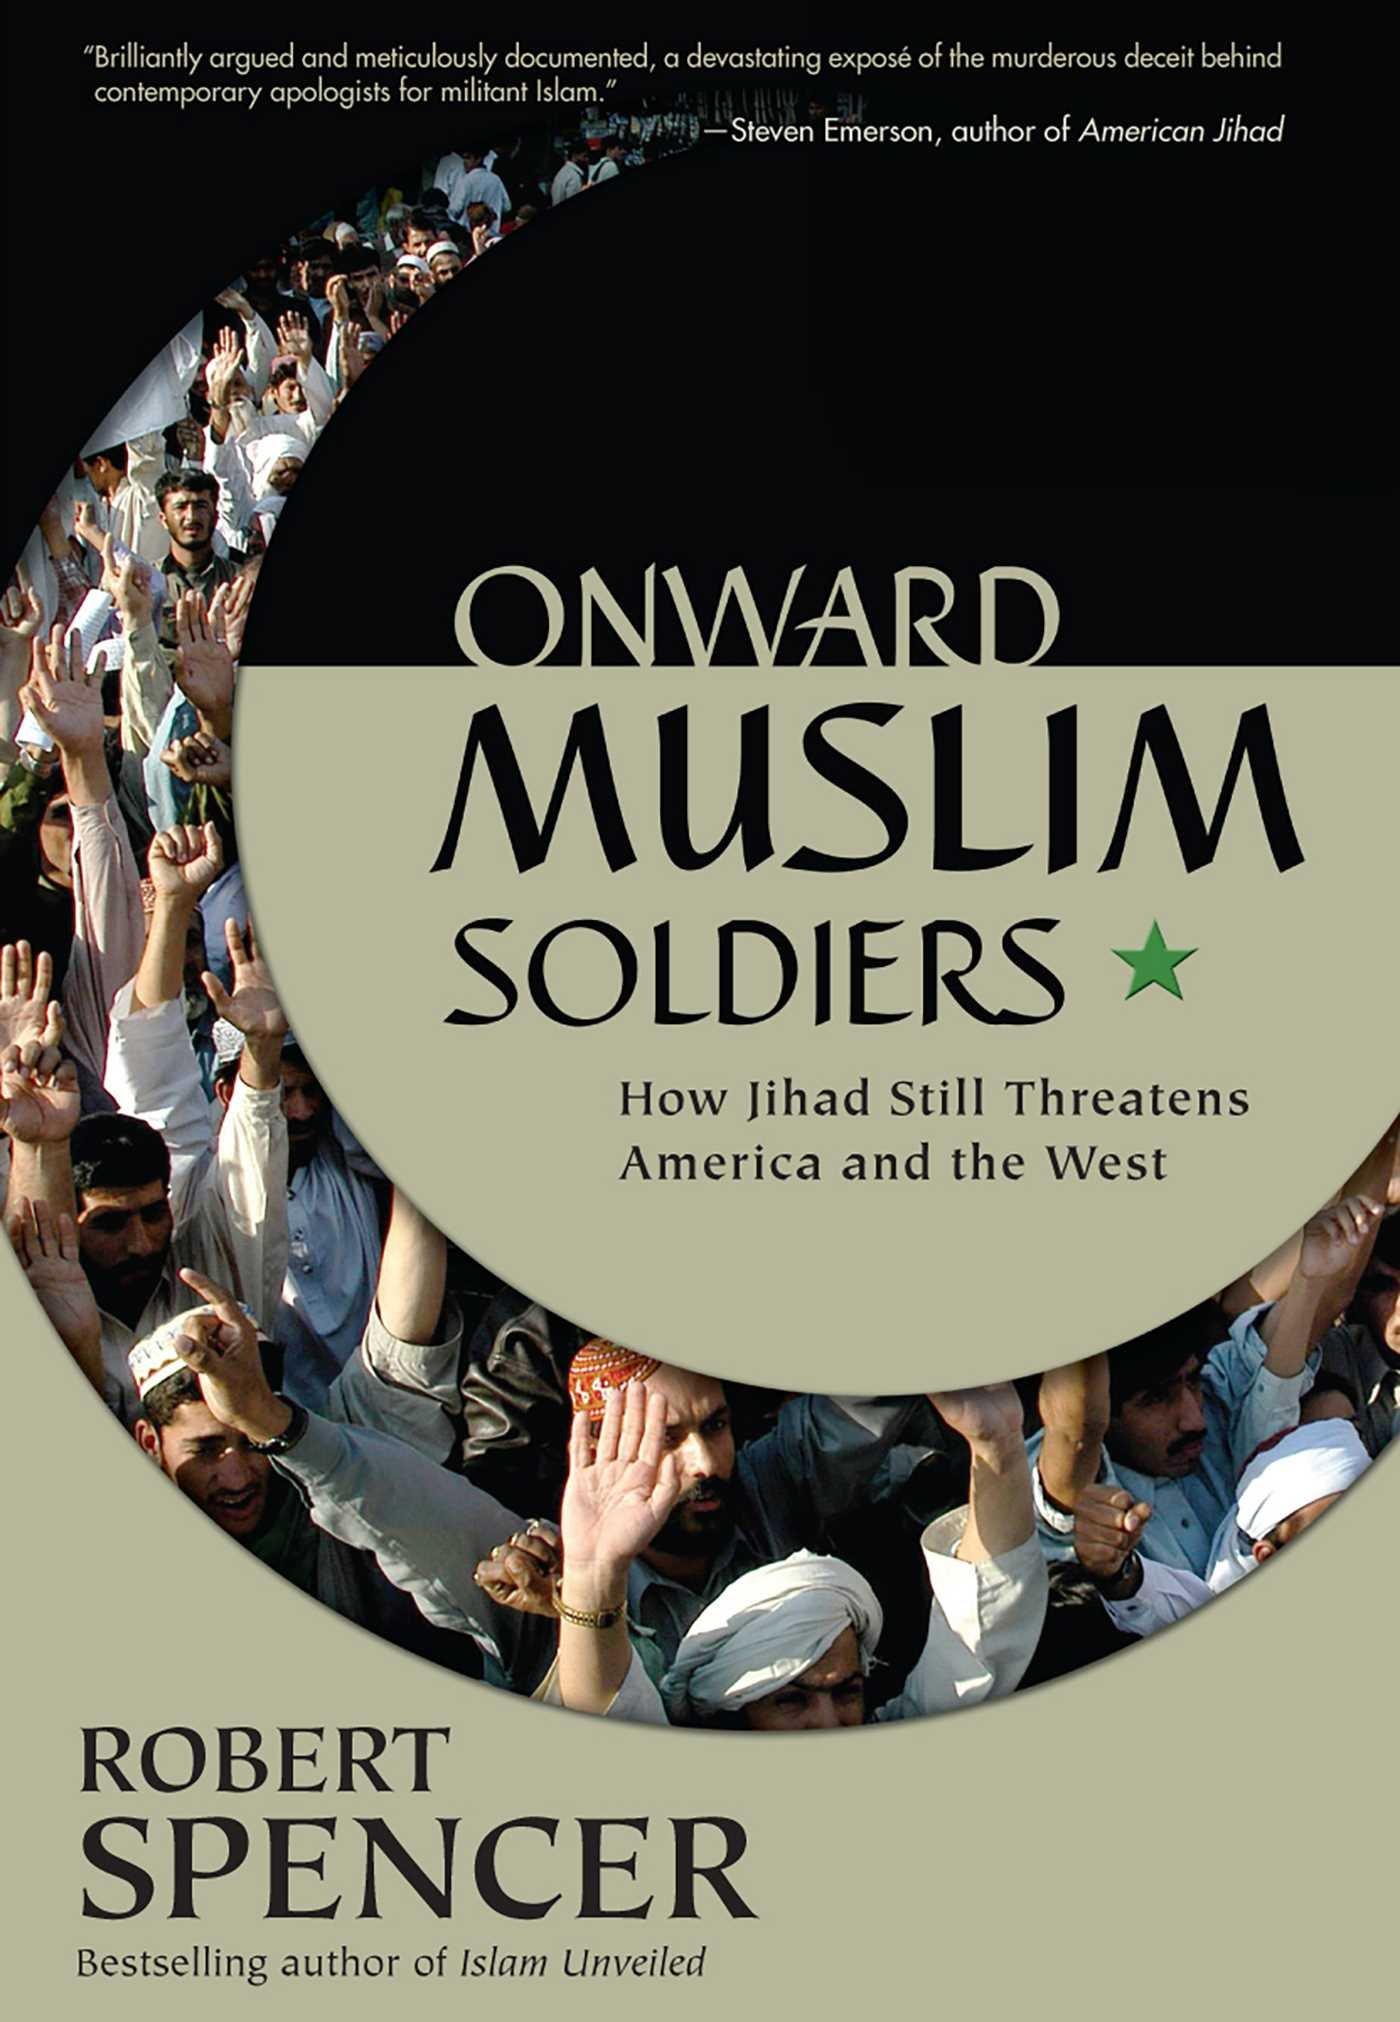 Onward Muslim Soldiers: How Jihad Still Threatens America and the West pdf